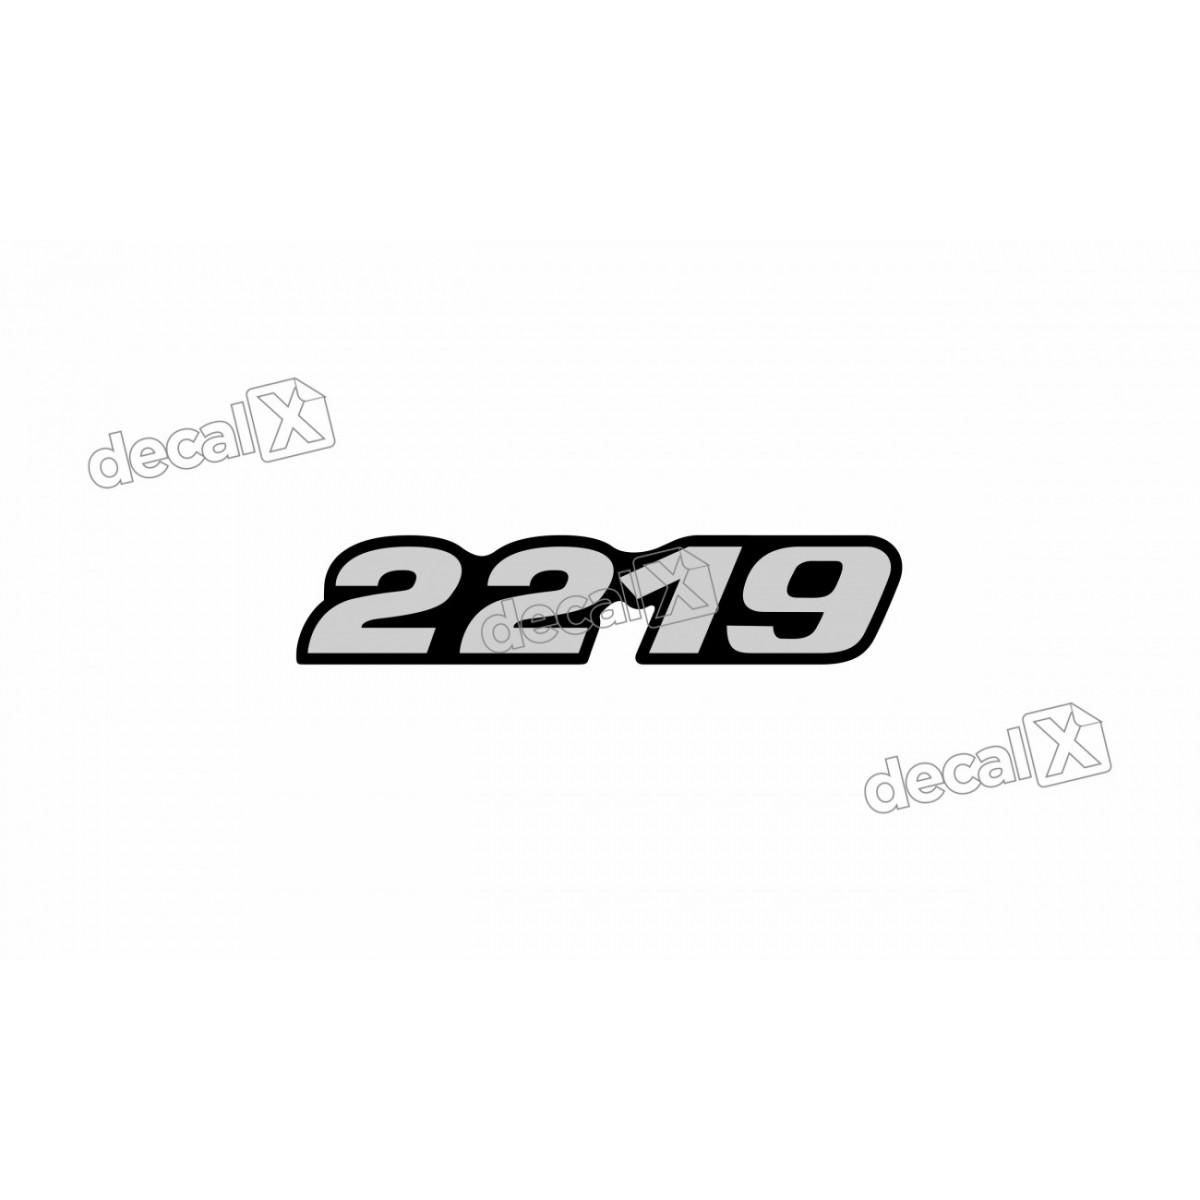 Adesivo Emblema Resinado Mercedes 2219 Cm81 Decalx